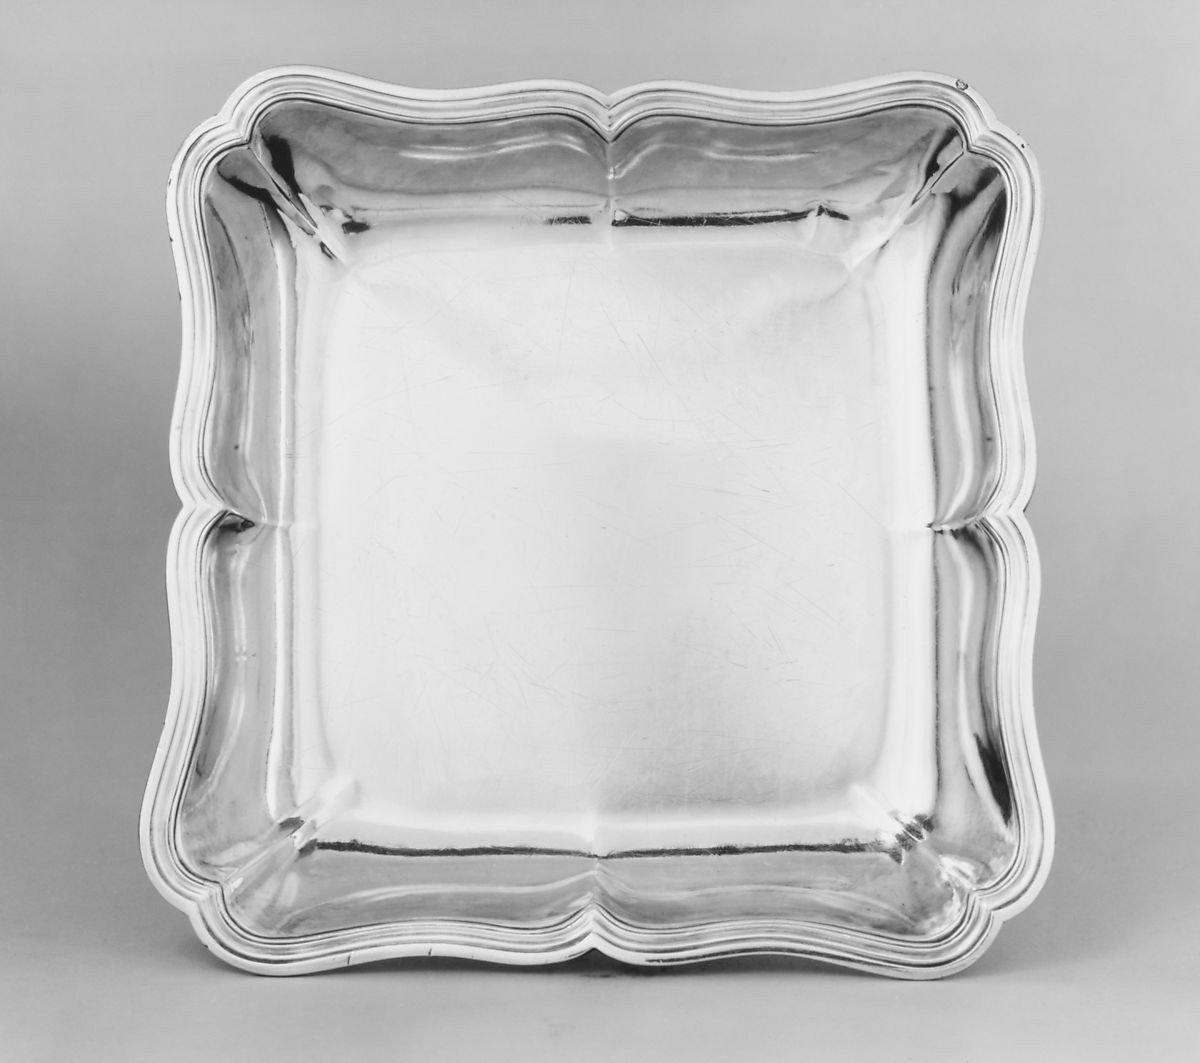 Dish, Sterling Silver By Jean-antoine Bourguet, Paris, 1760-1761-photo-4